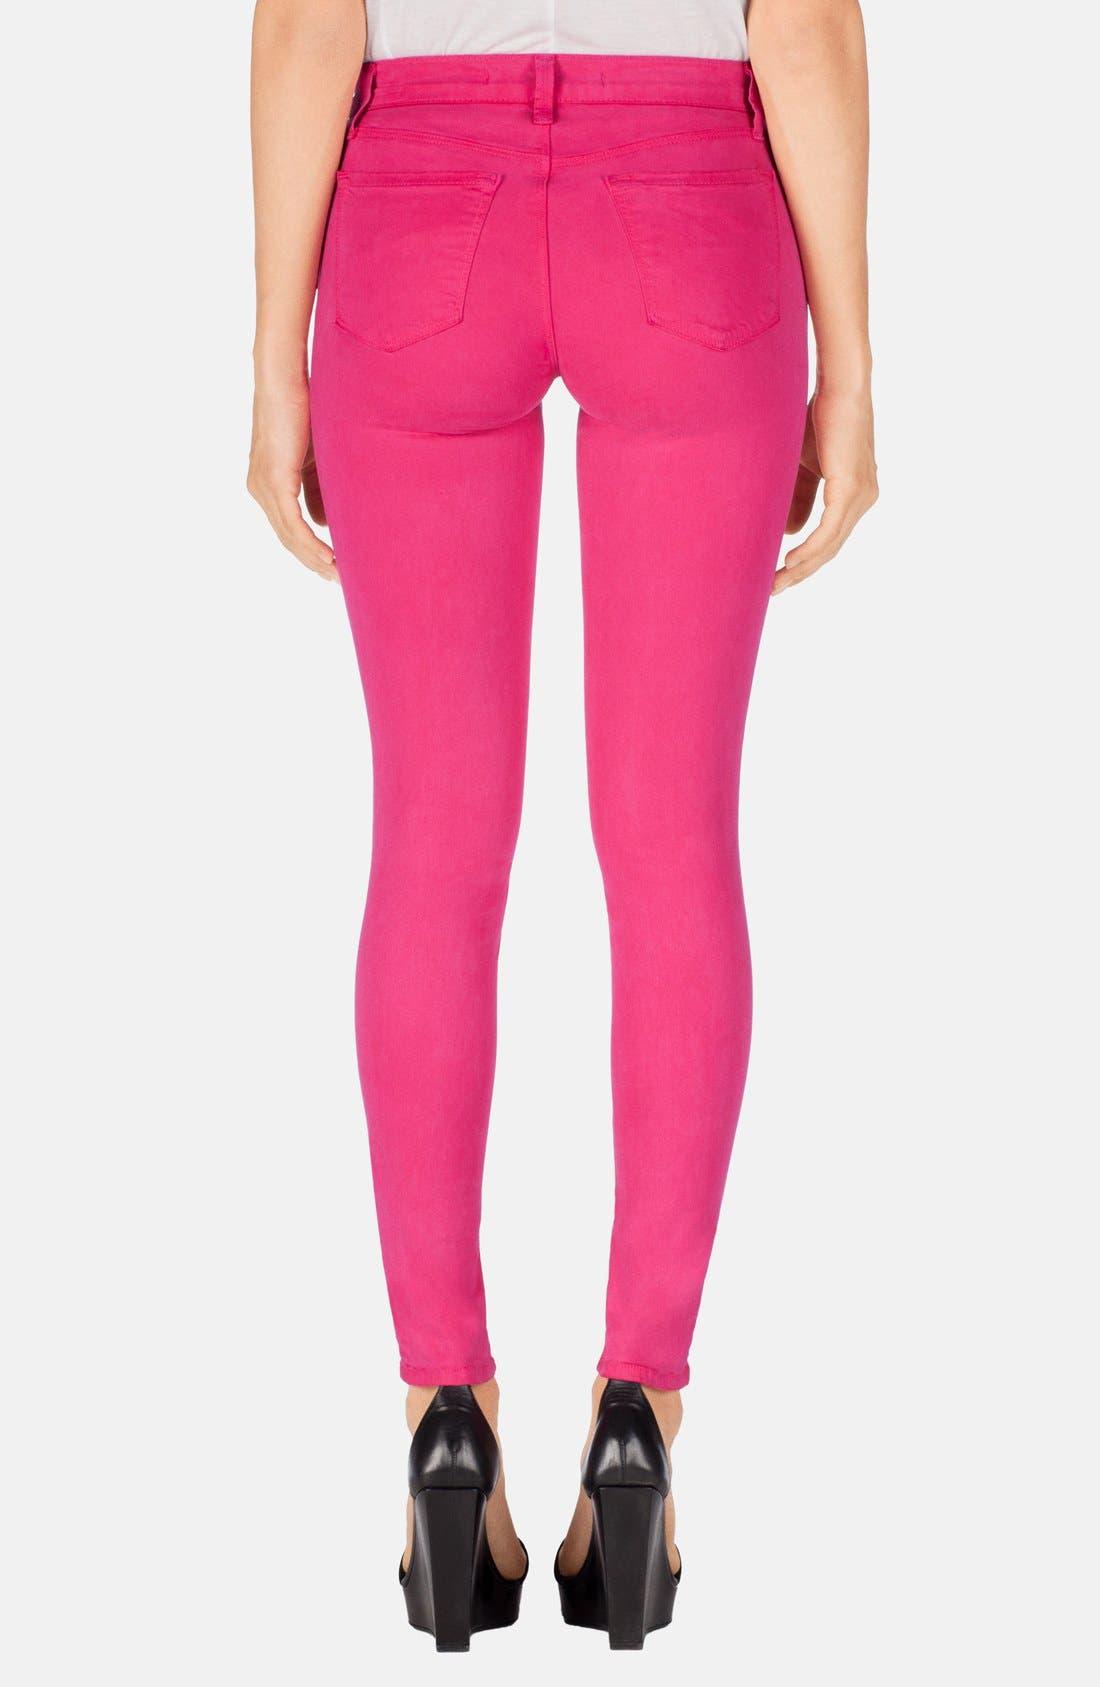 Alternate Image 2  - J Brand '485' Mid Rise Super Skinny Jeans (Wildflower)